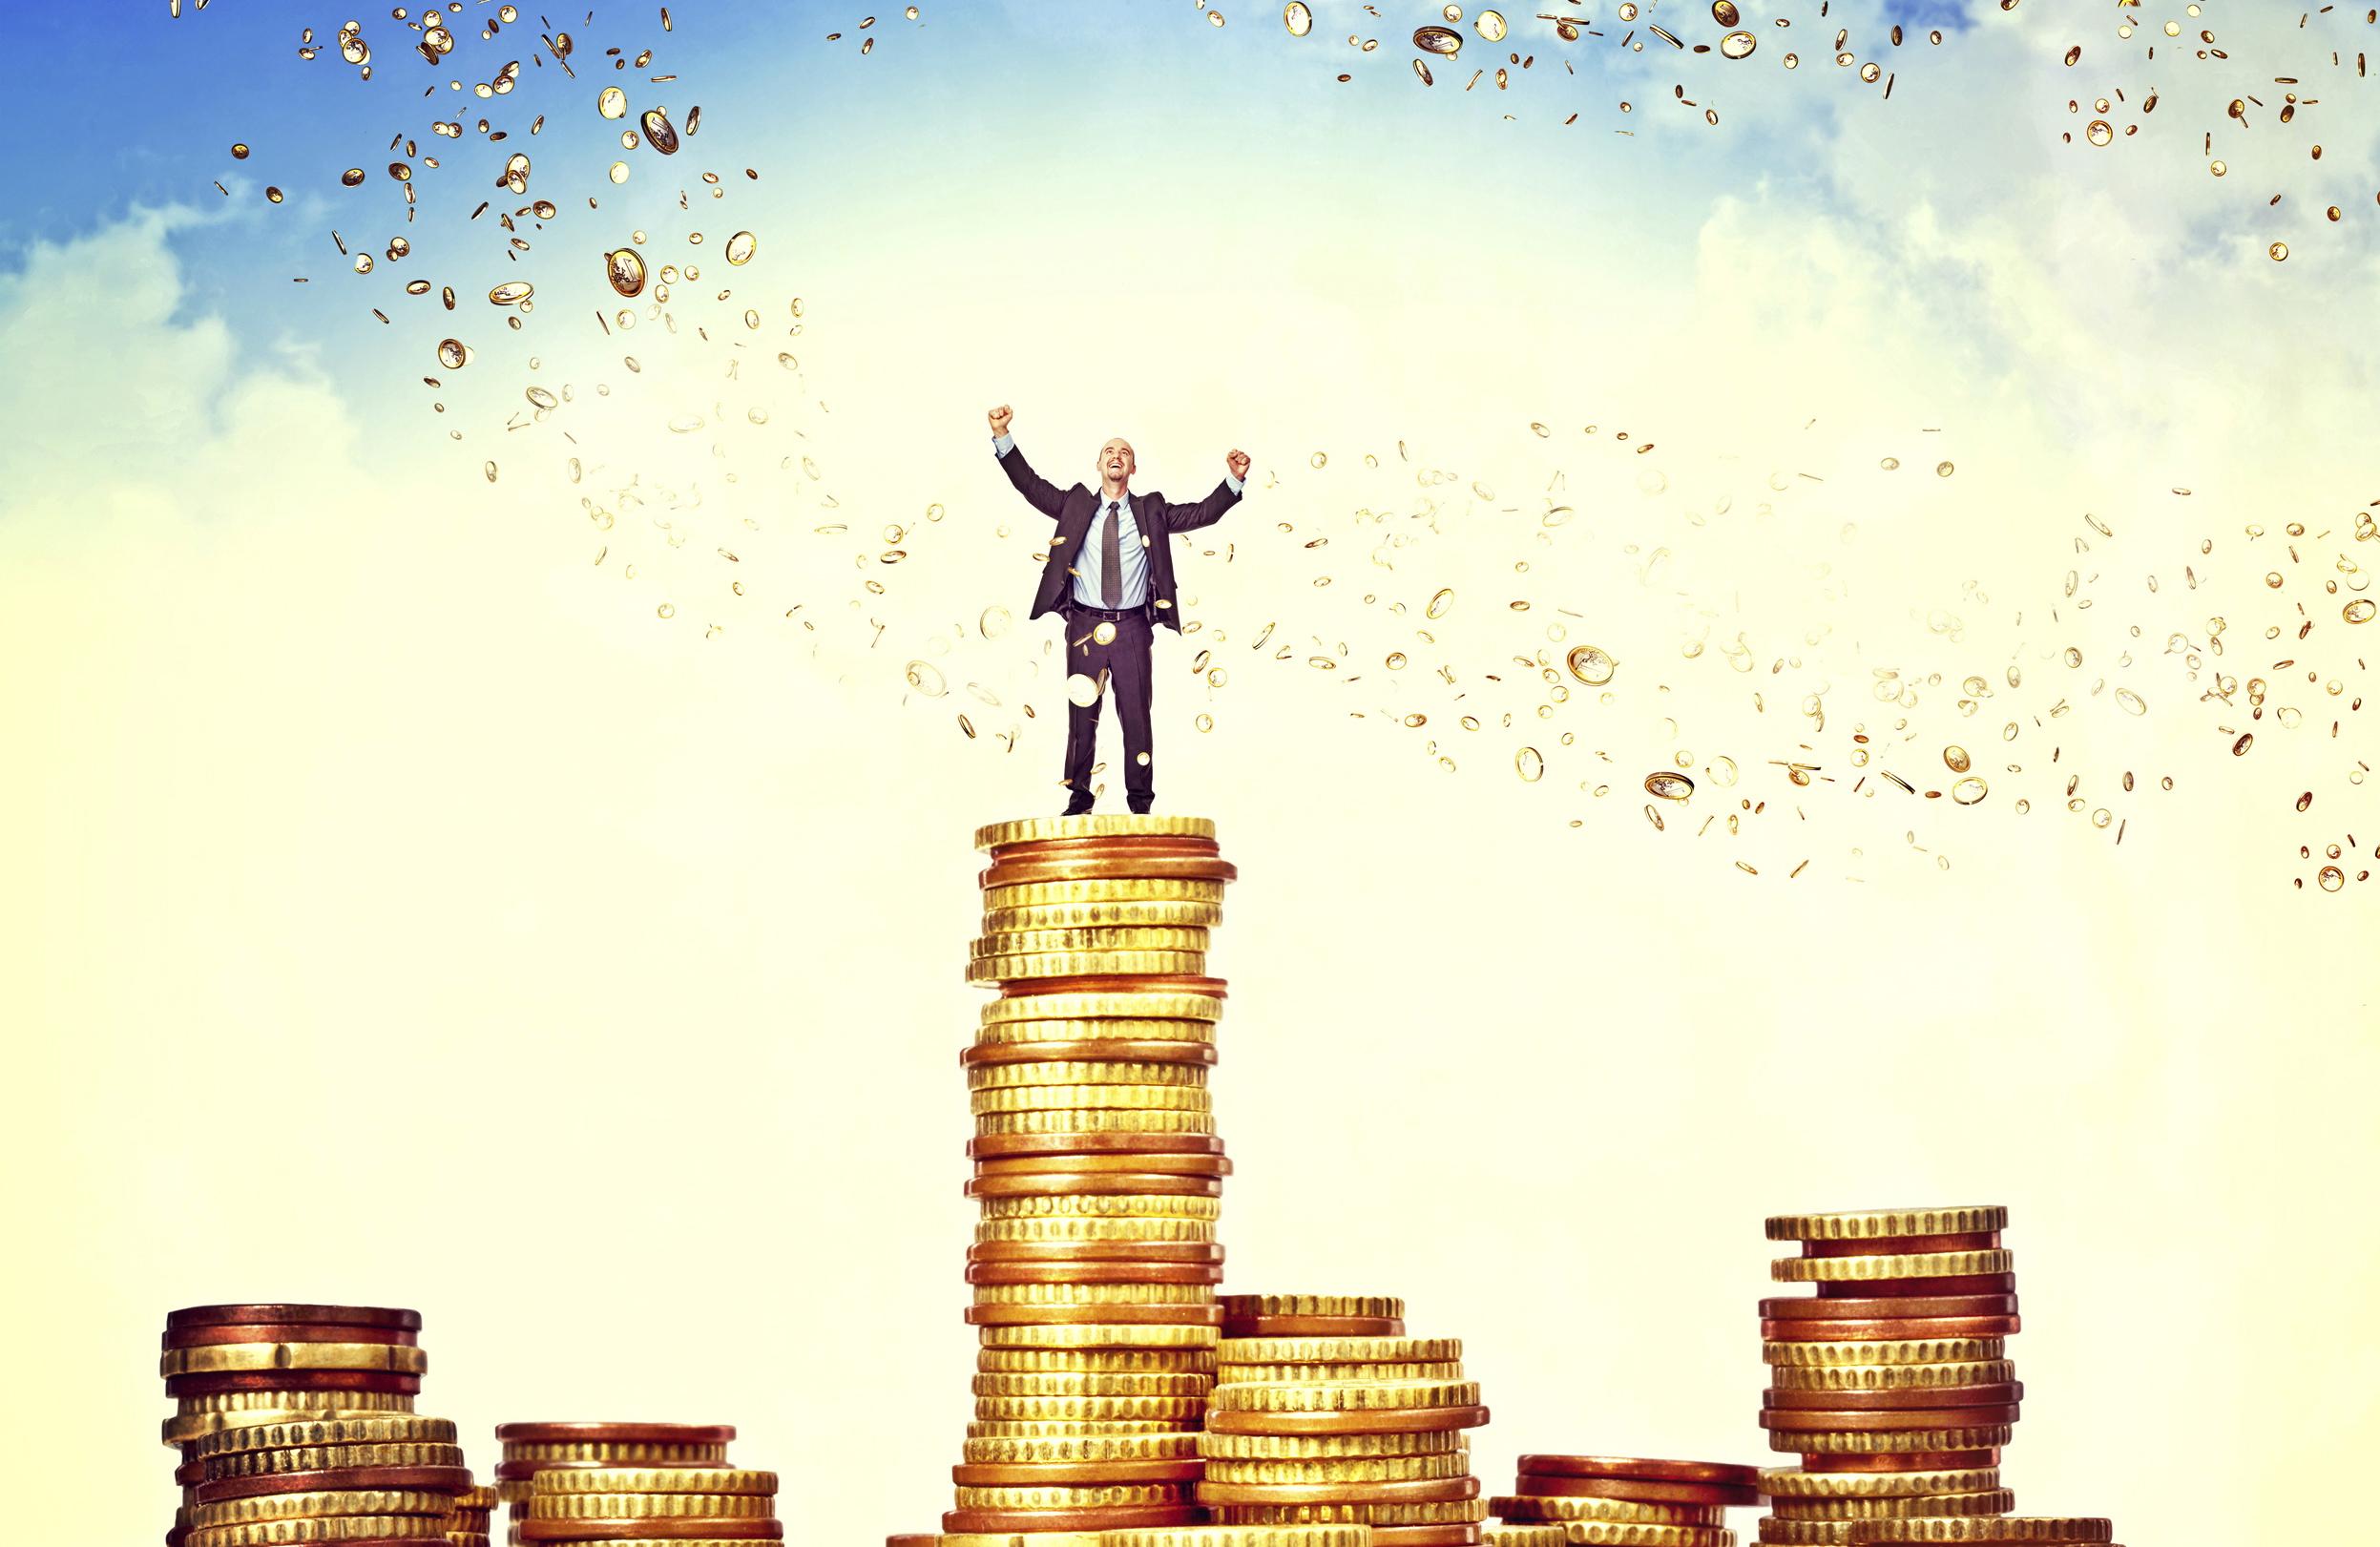 transform idea into money